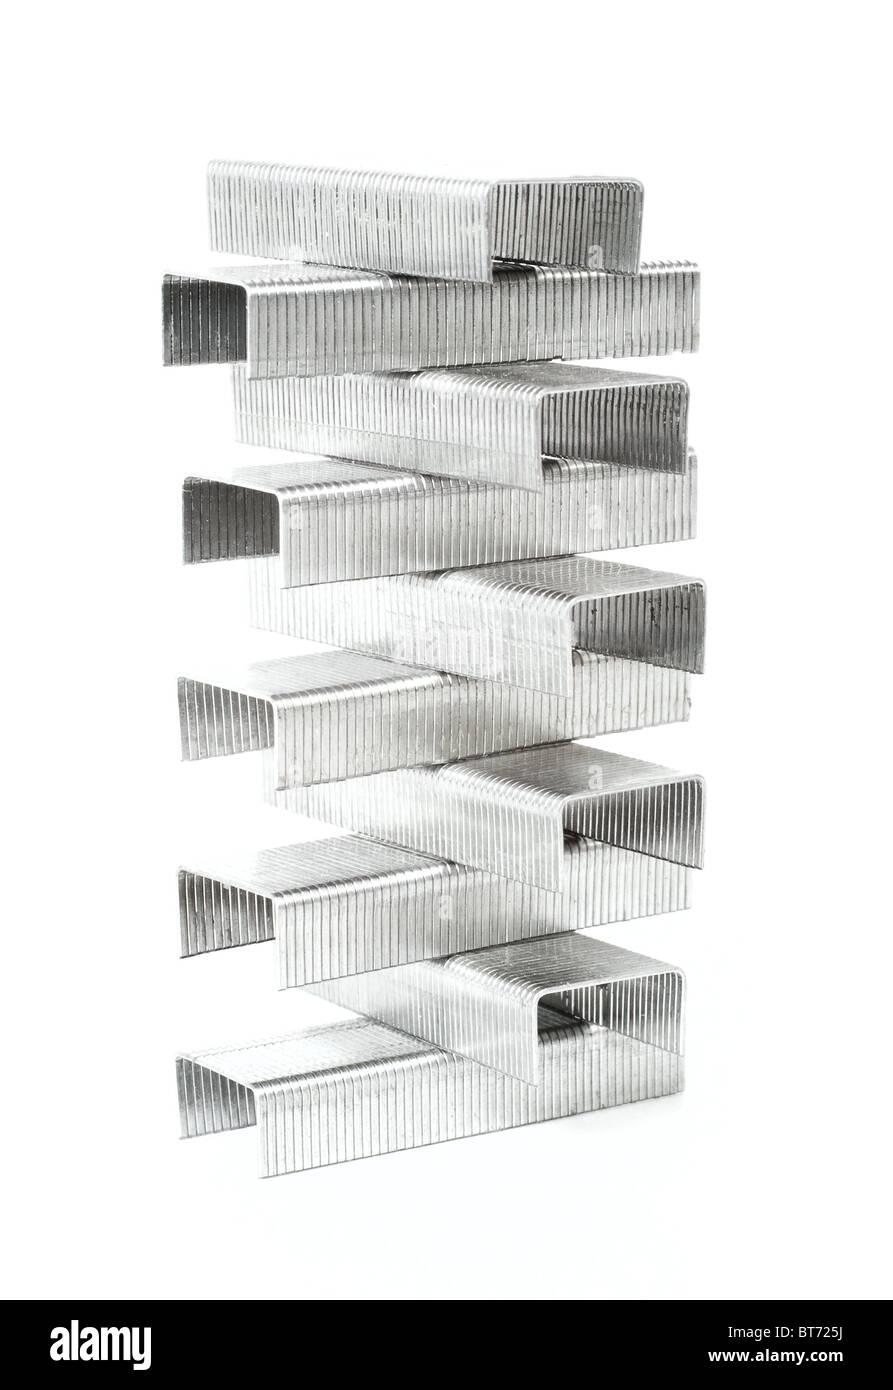 Staples isolated on white background - Stock Image